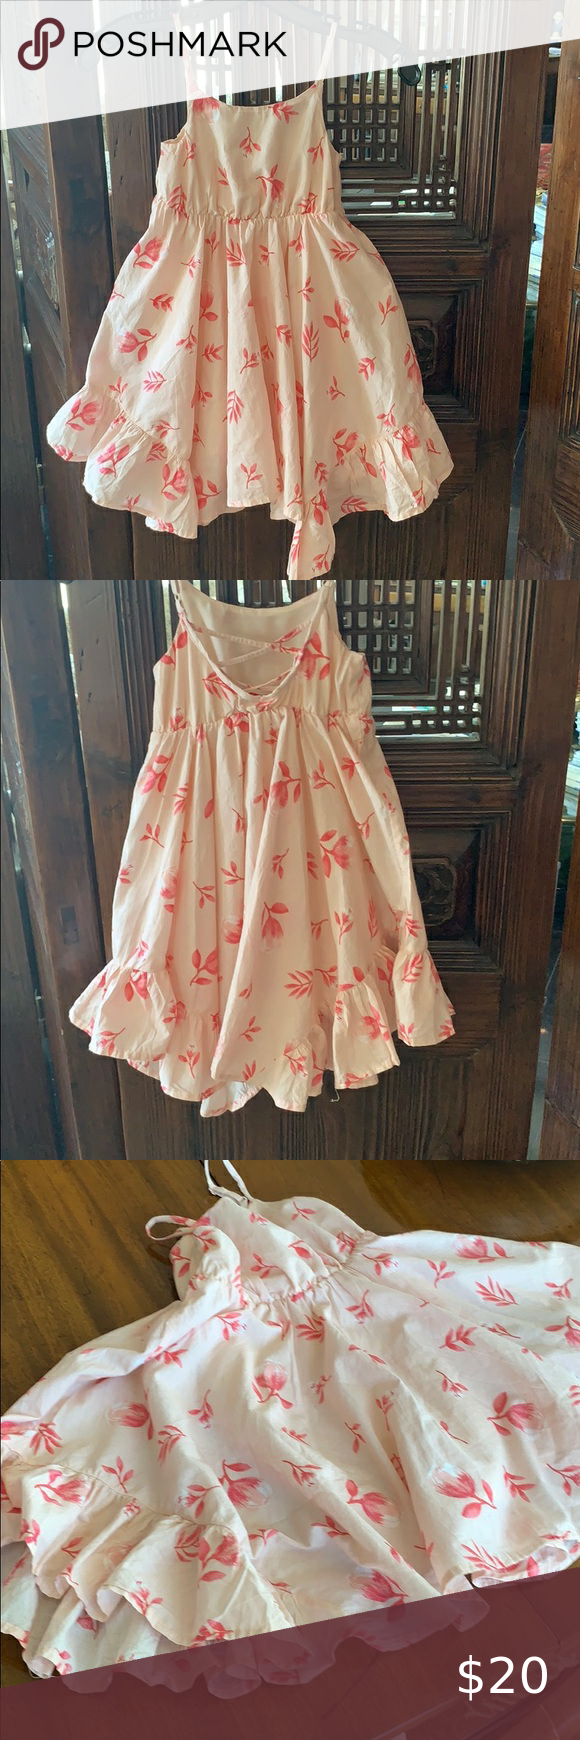 Nwt Tommy Bahama Pink Dress Sz 4t Pink Dress Tommy Bahama Dress Dresses [ 1740 x 580 Pixel ]